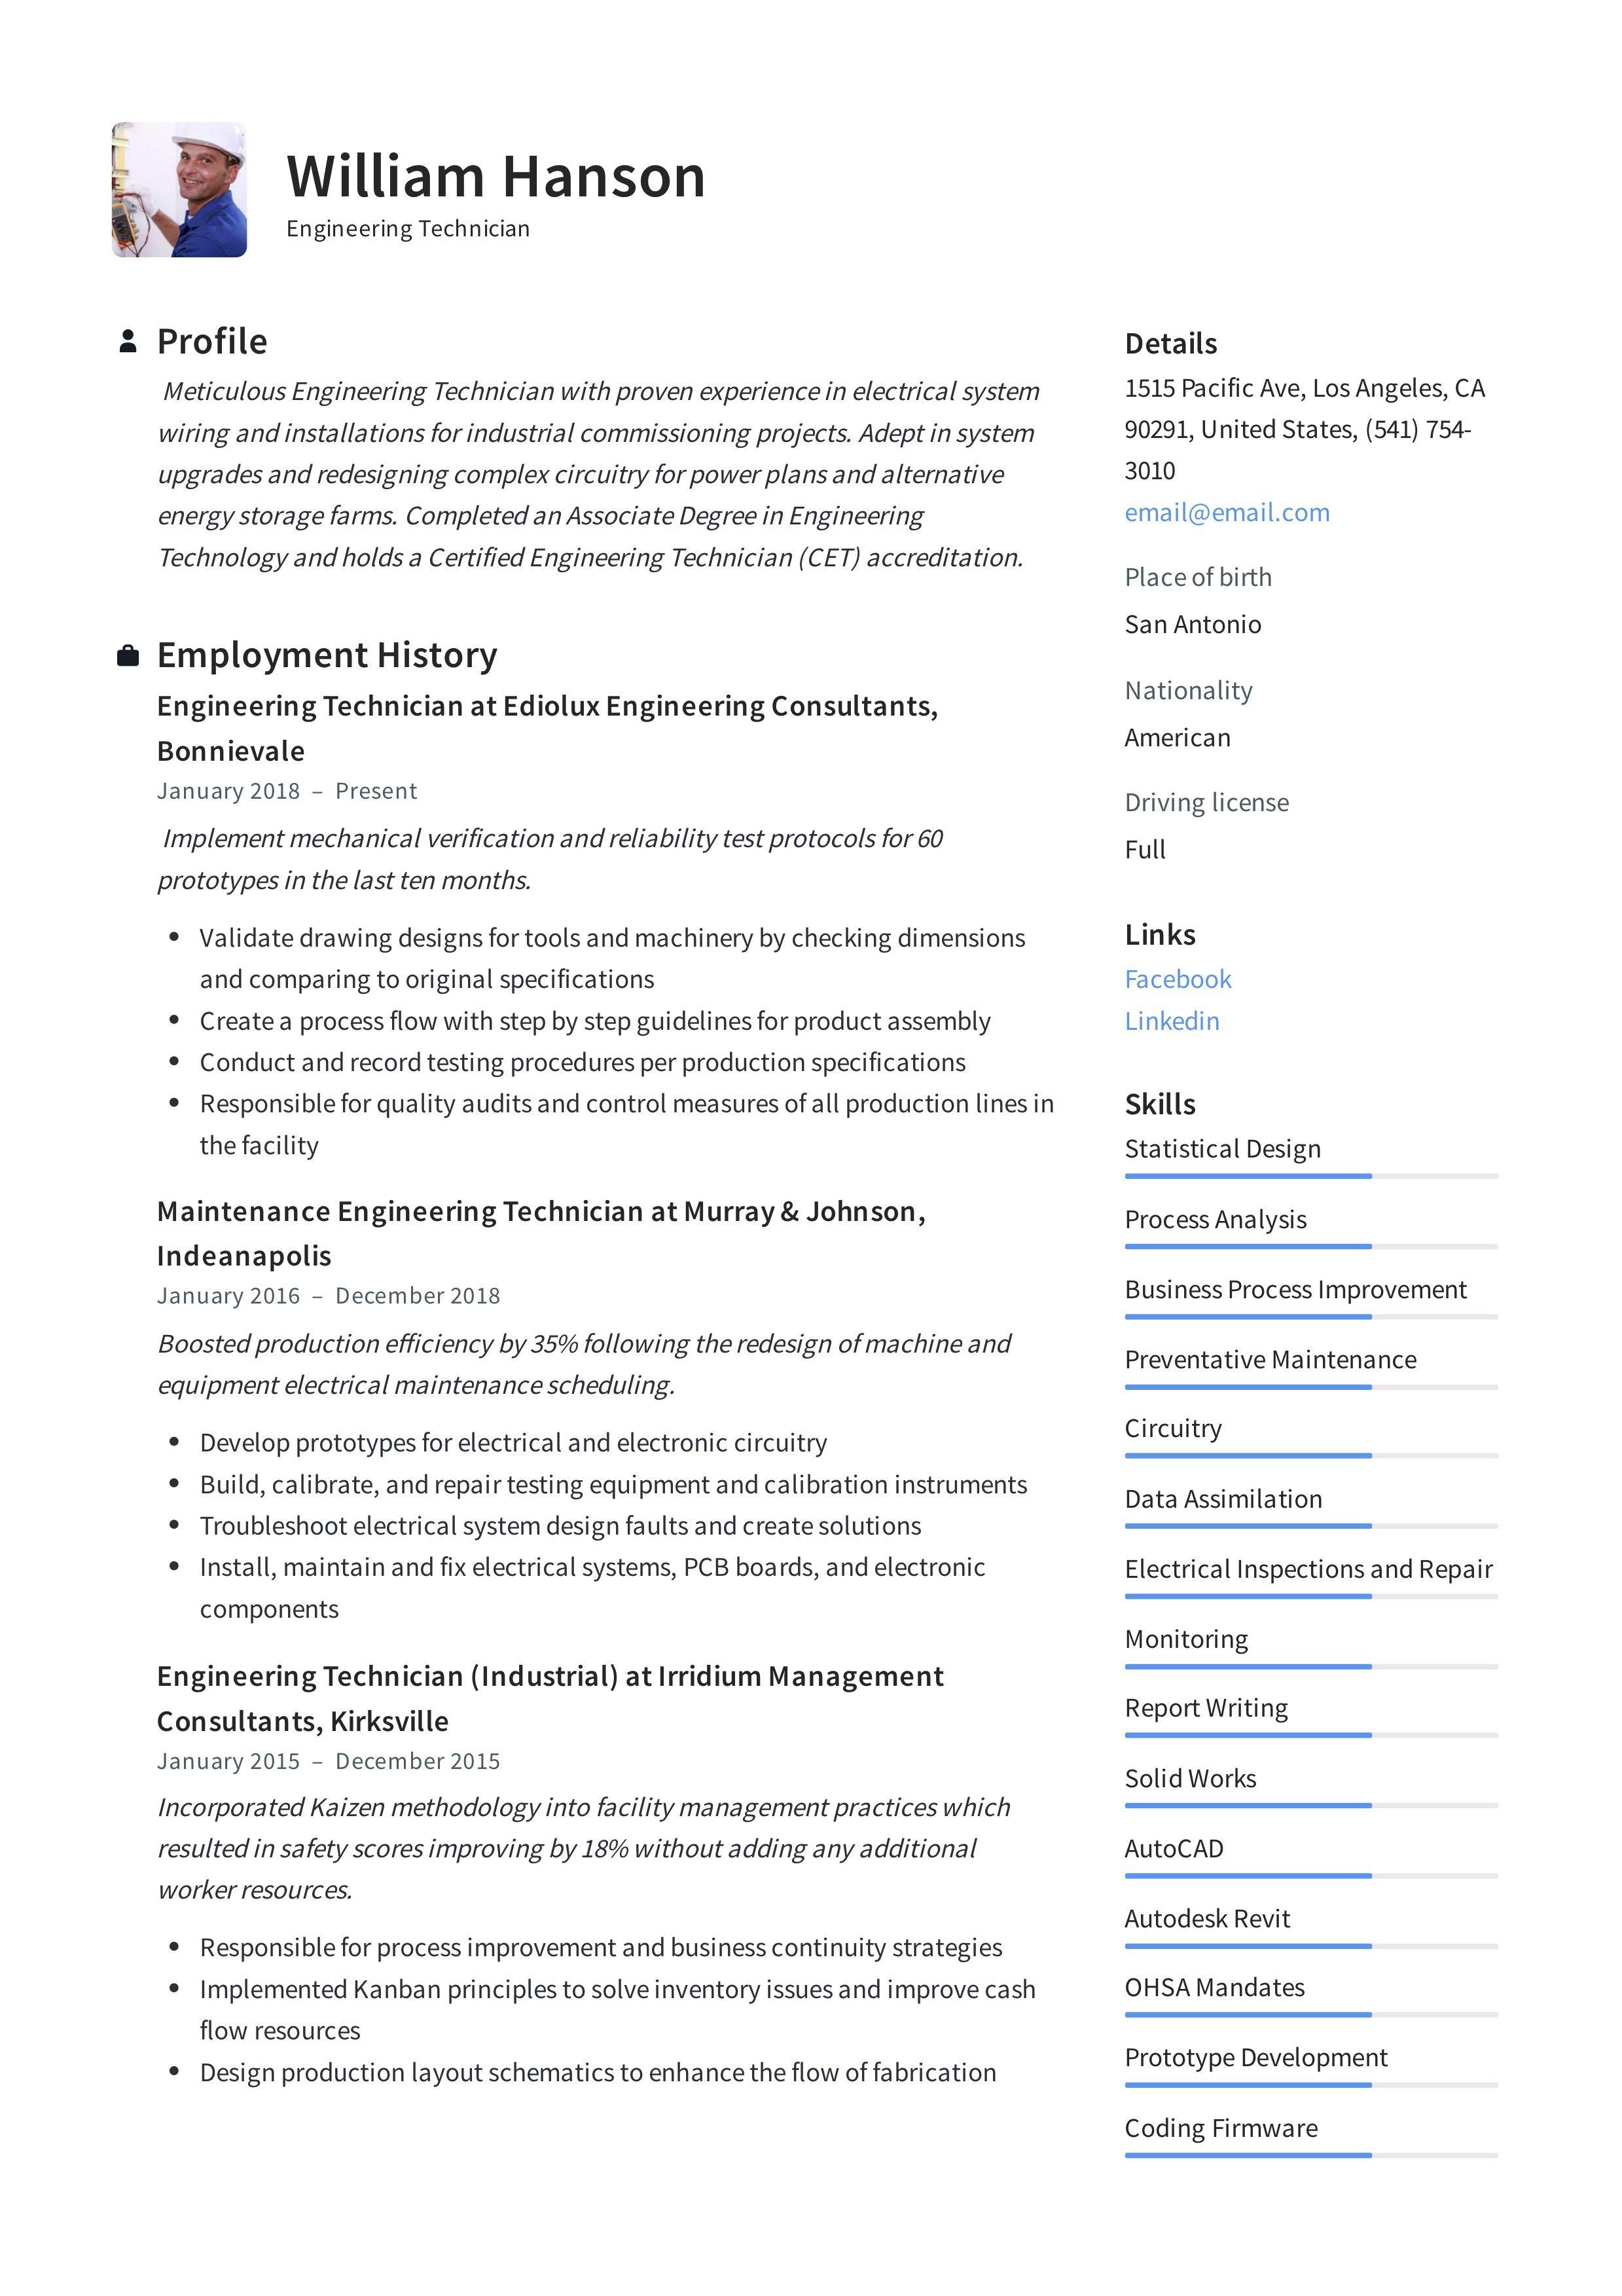 Engineering Technician Resume Template In 2020 Engineering Student Engineering Resume Student Resume